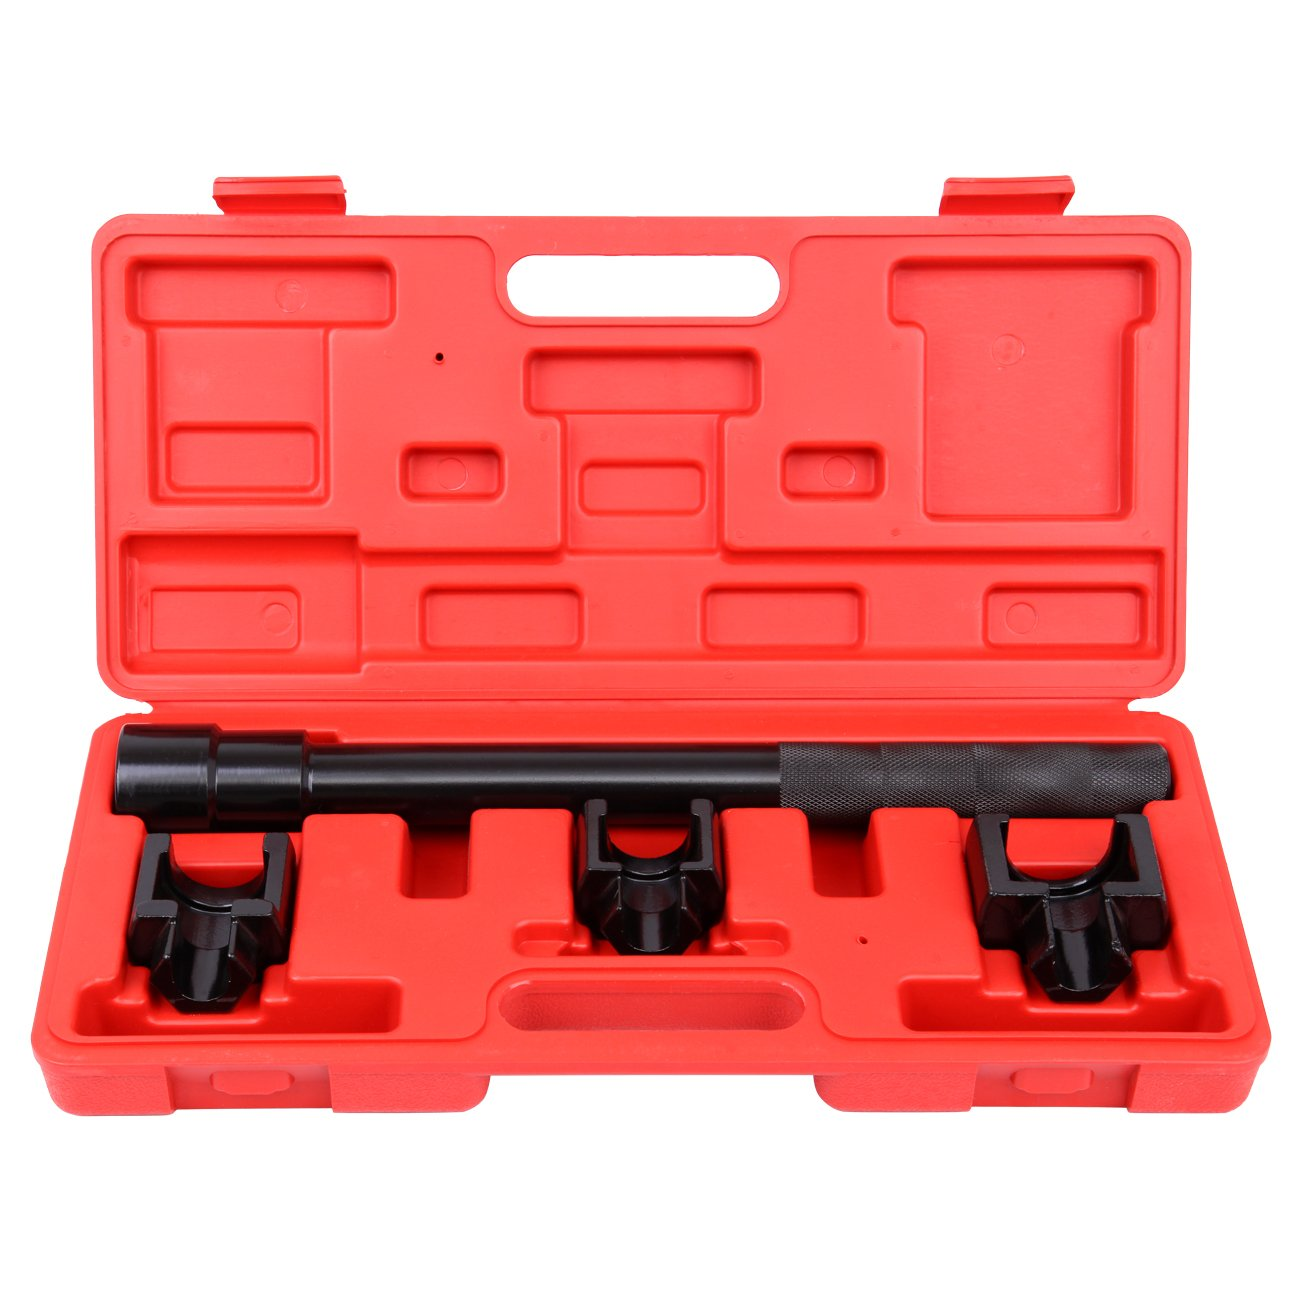 Honhill Inner Tie Rod Removal Set 4pc Mechanics Installation Adjusting Tool Kit Dual Mechanics Socket Adapter